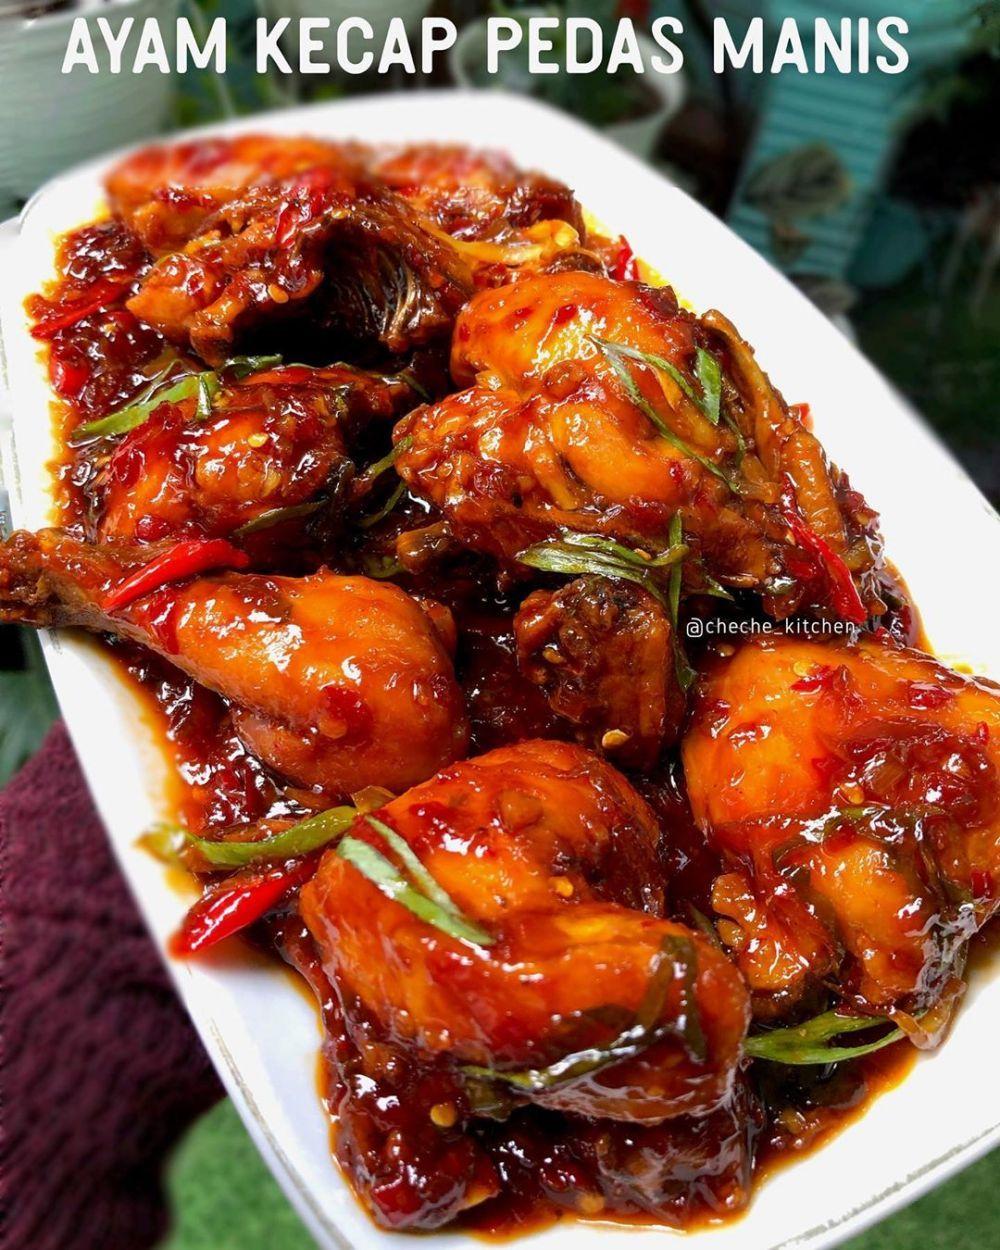 Resep Ayam Kecap Spesial Instagram Resep Ayam Resep Masakan Resep Sayap Ayam